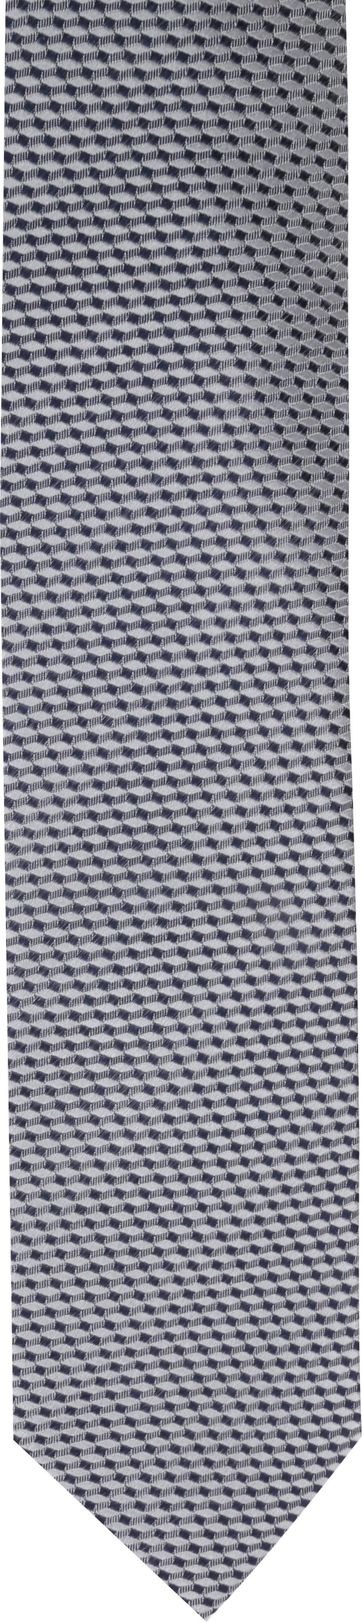 Suitable Krawatte Grau F01-36